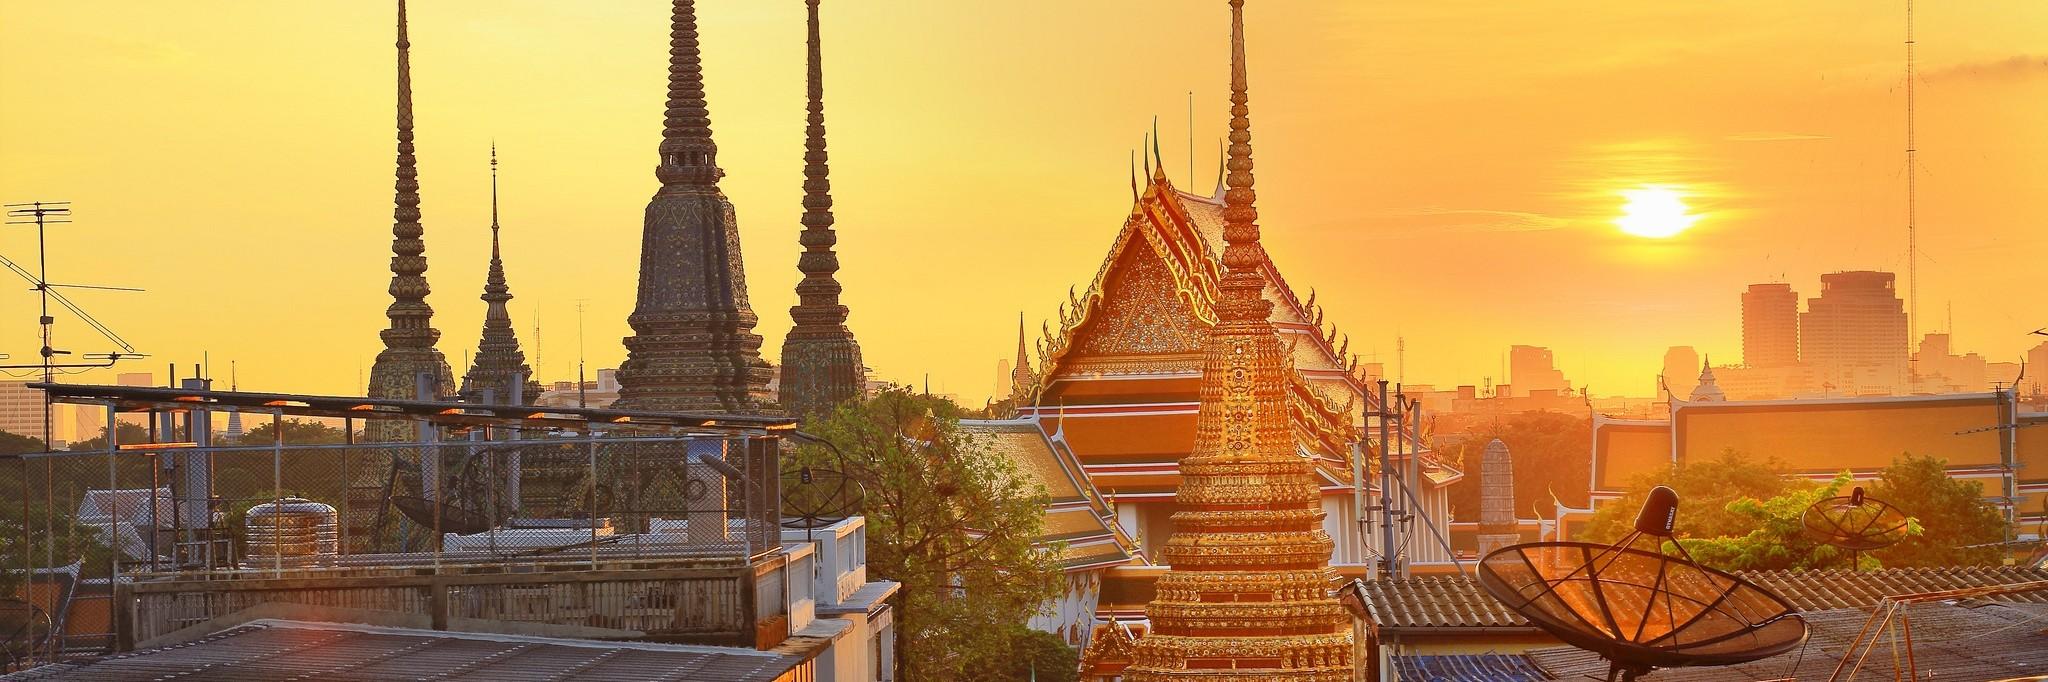 http://gody.vn/blog/donvacspruillqu6371/post/du-lich-thai-lan-bangkok-krabi-tu-tuc-chi-55-trieunguoi-78